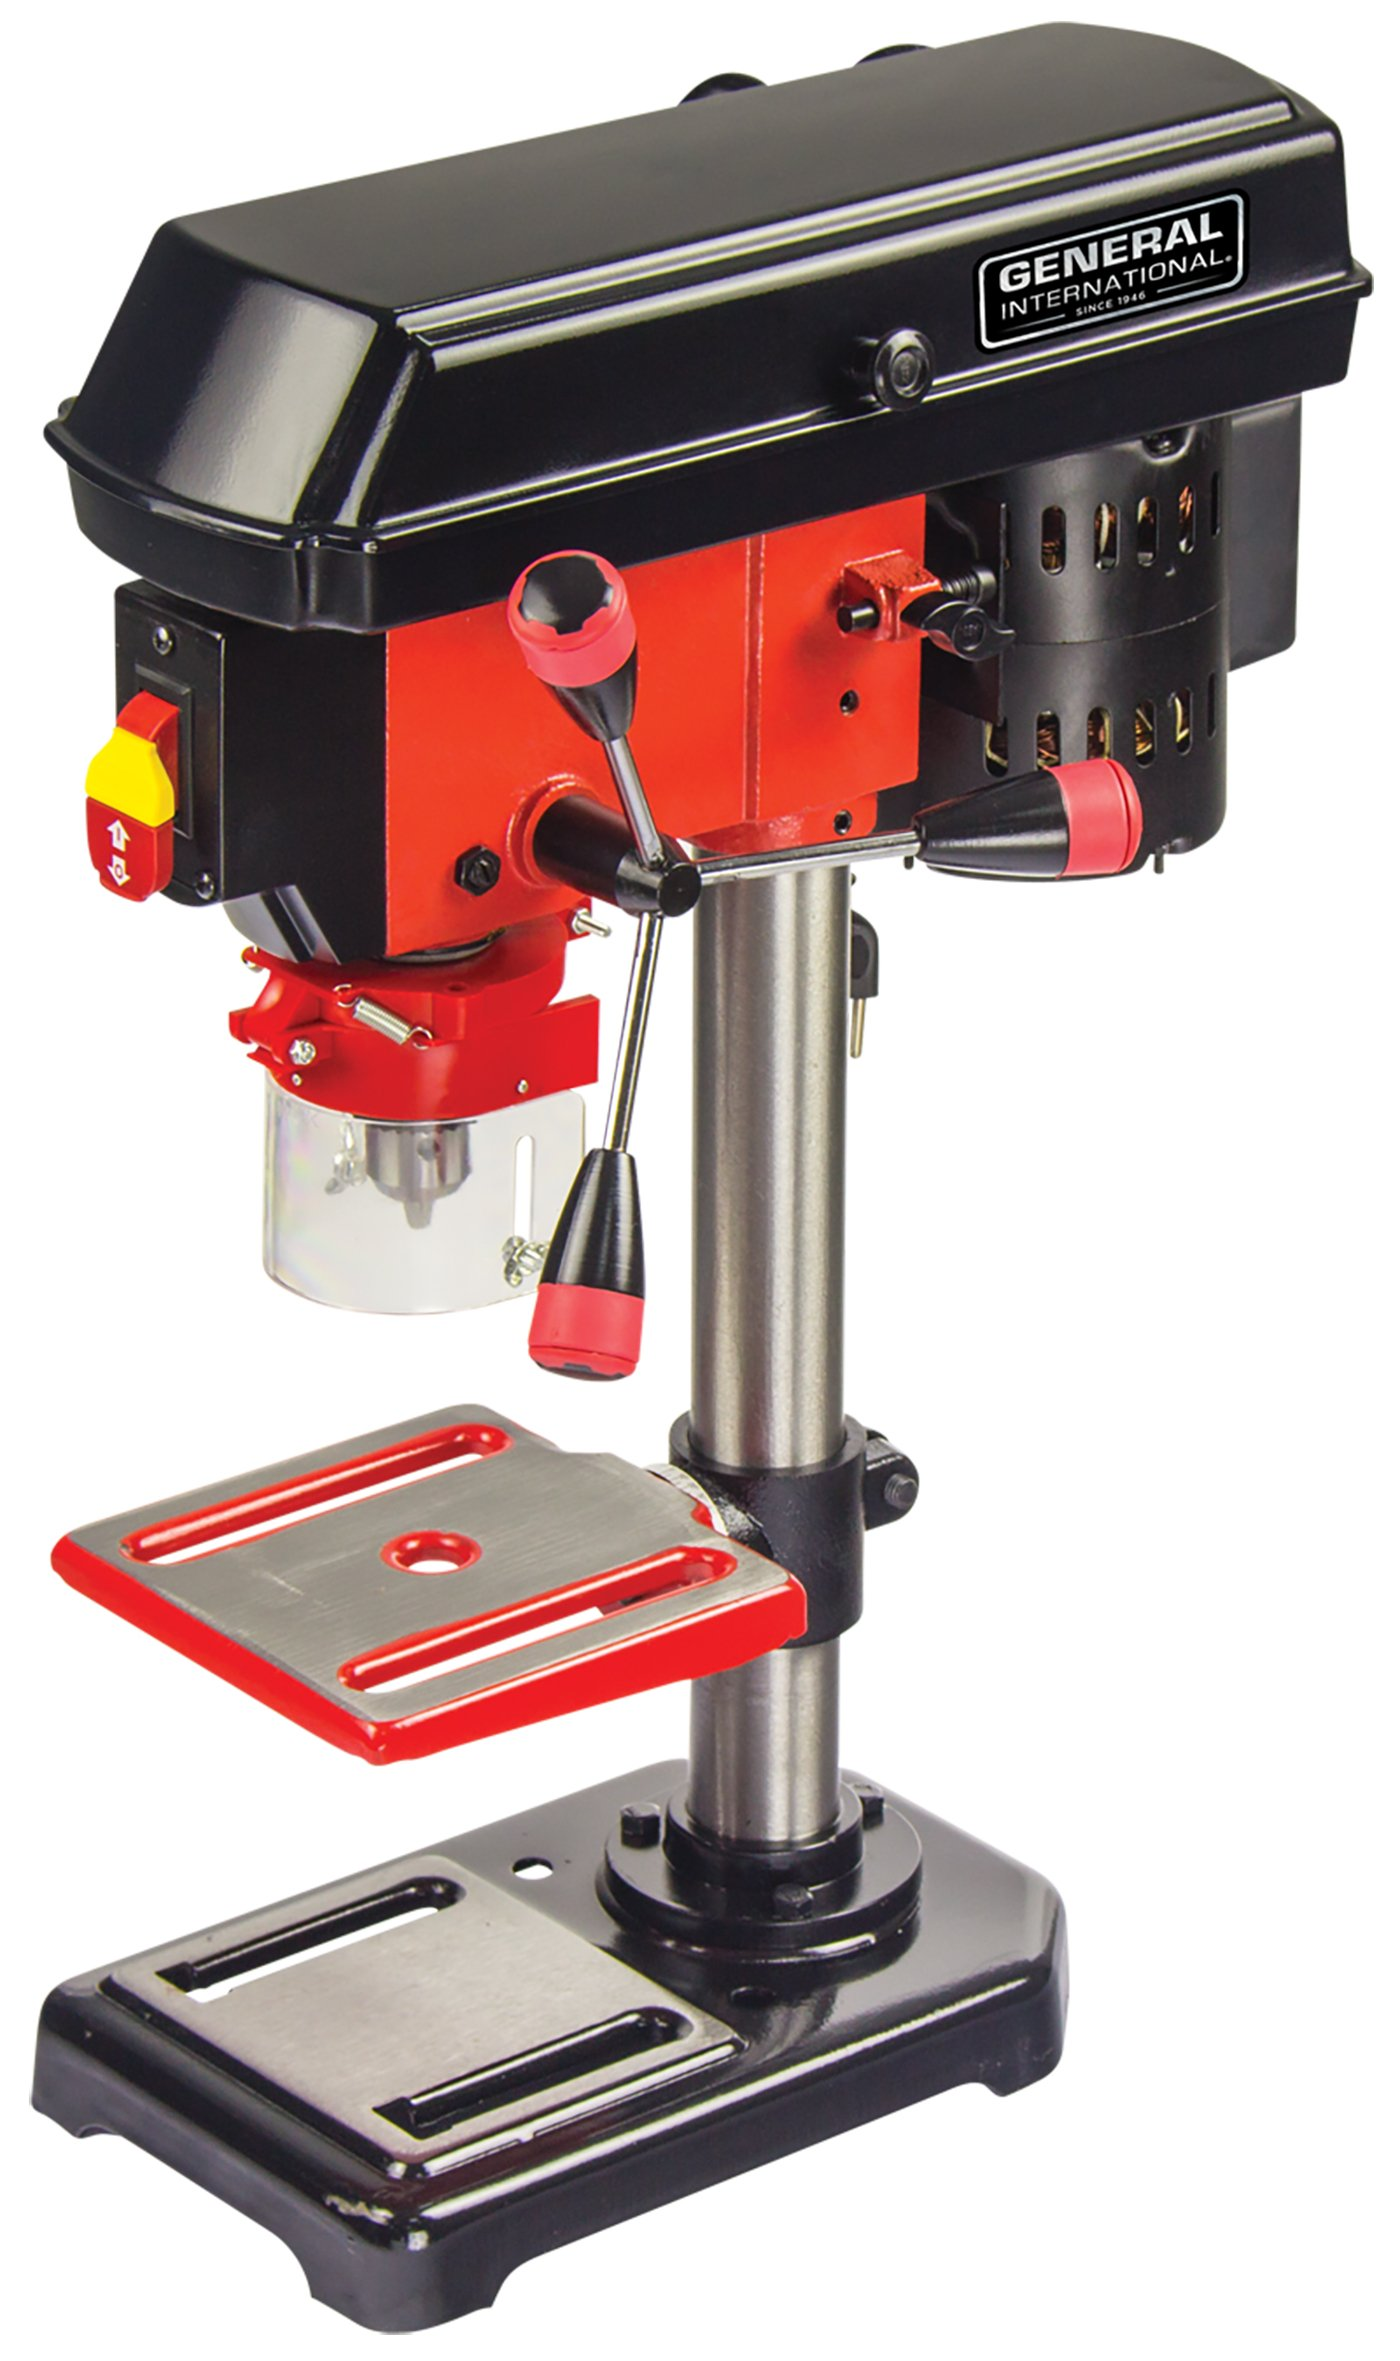 General International General Intl DP2001 5-Speed Drill Press, 8'', Red, Black & Gray